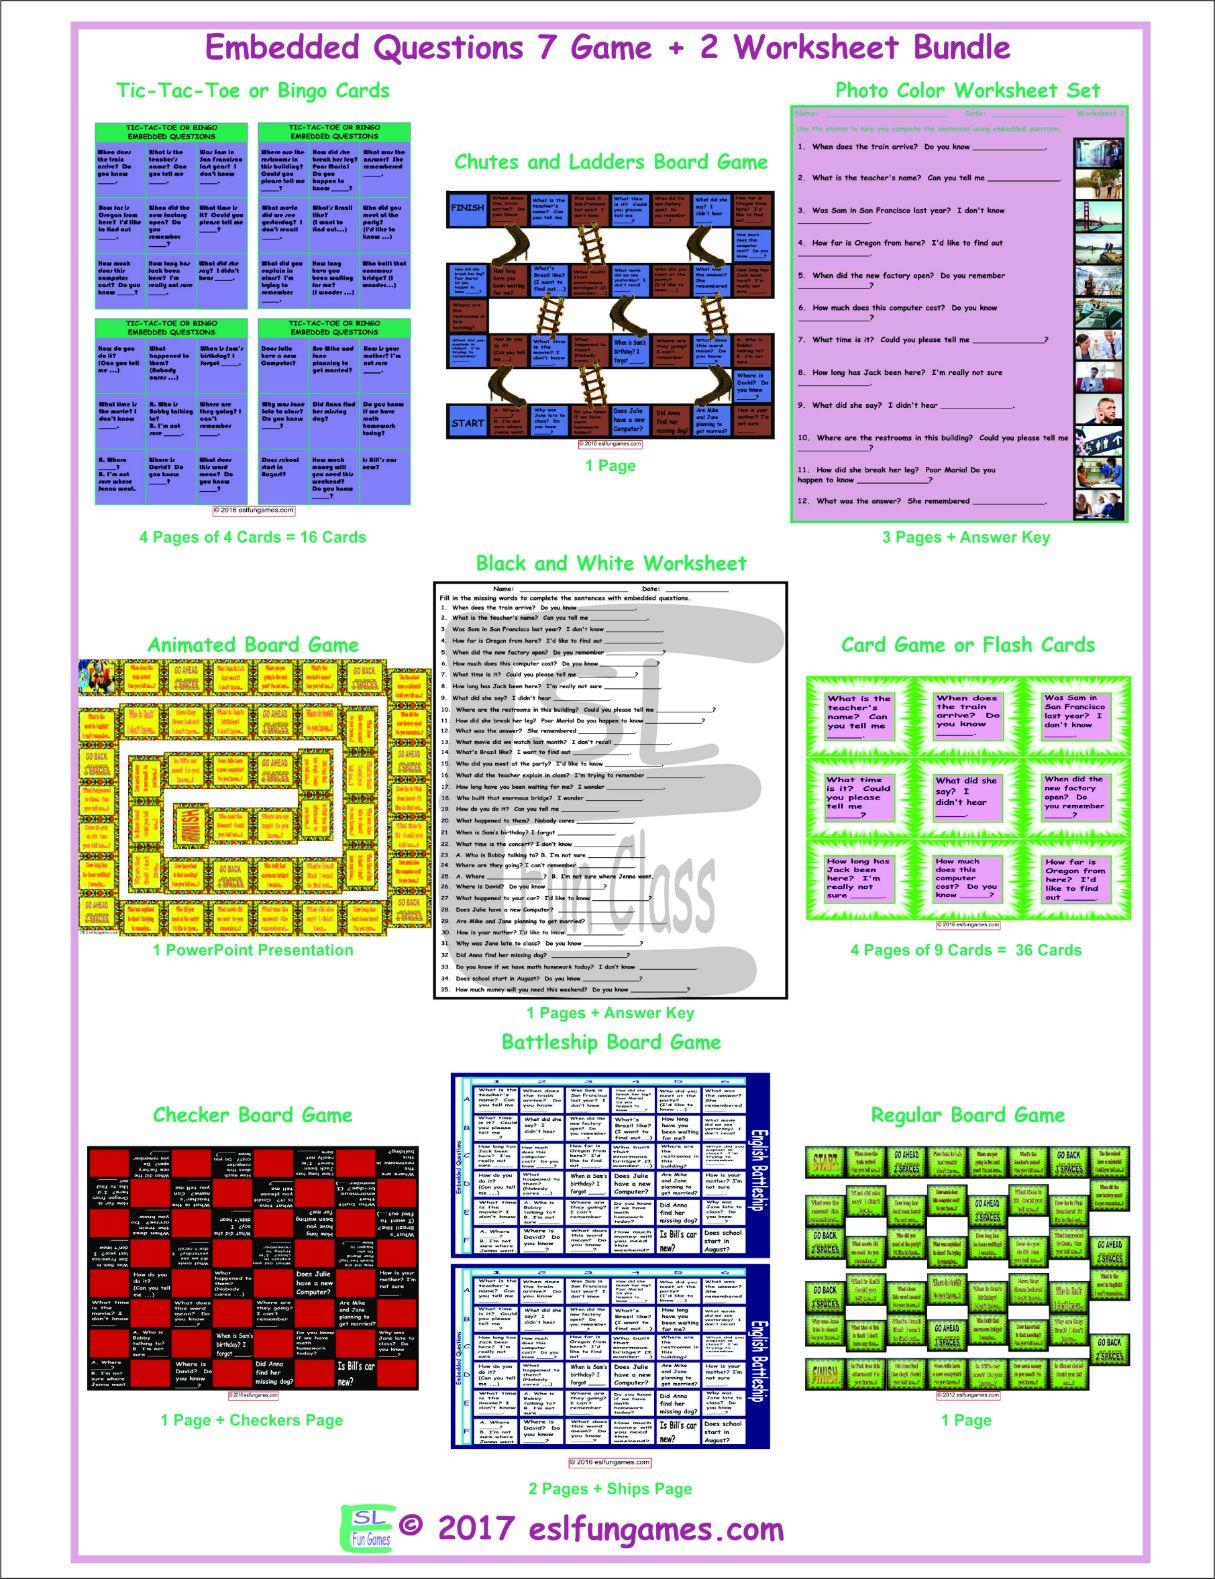 Embedded Questions 7 Game Plus 2 Worksheet Bundle By Eslfungames